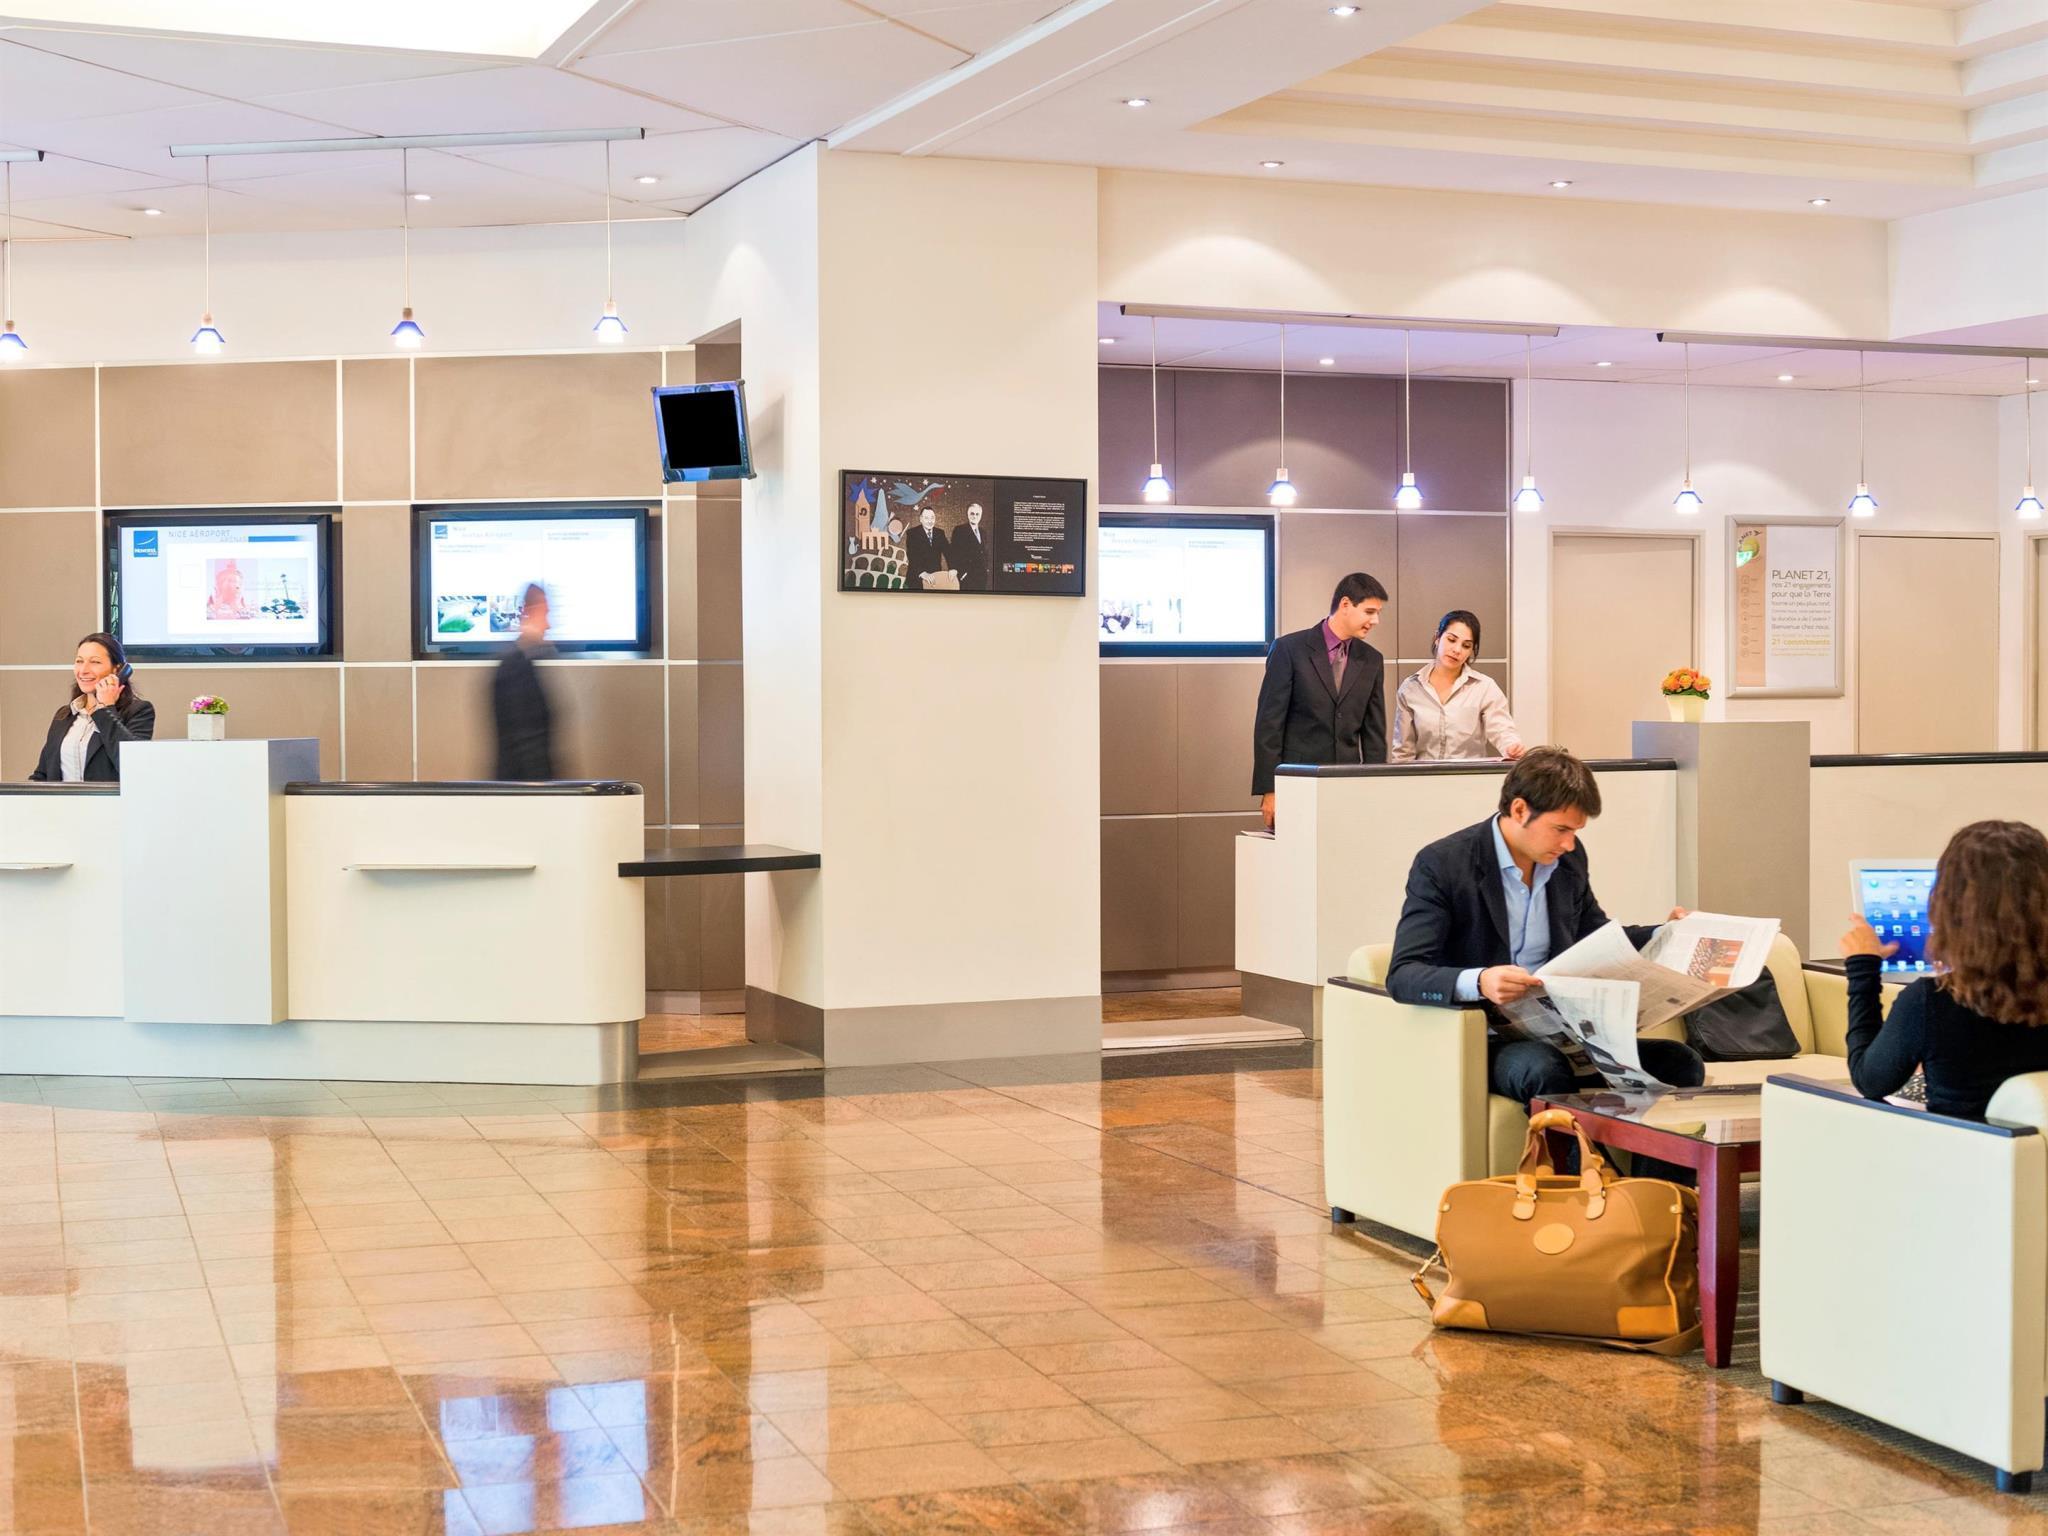 Novotel Nice Arenas Airport Hotel